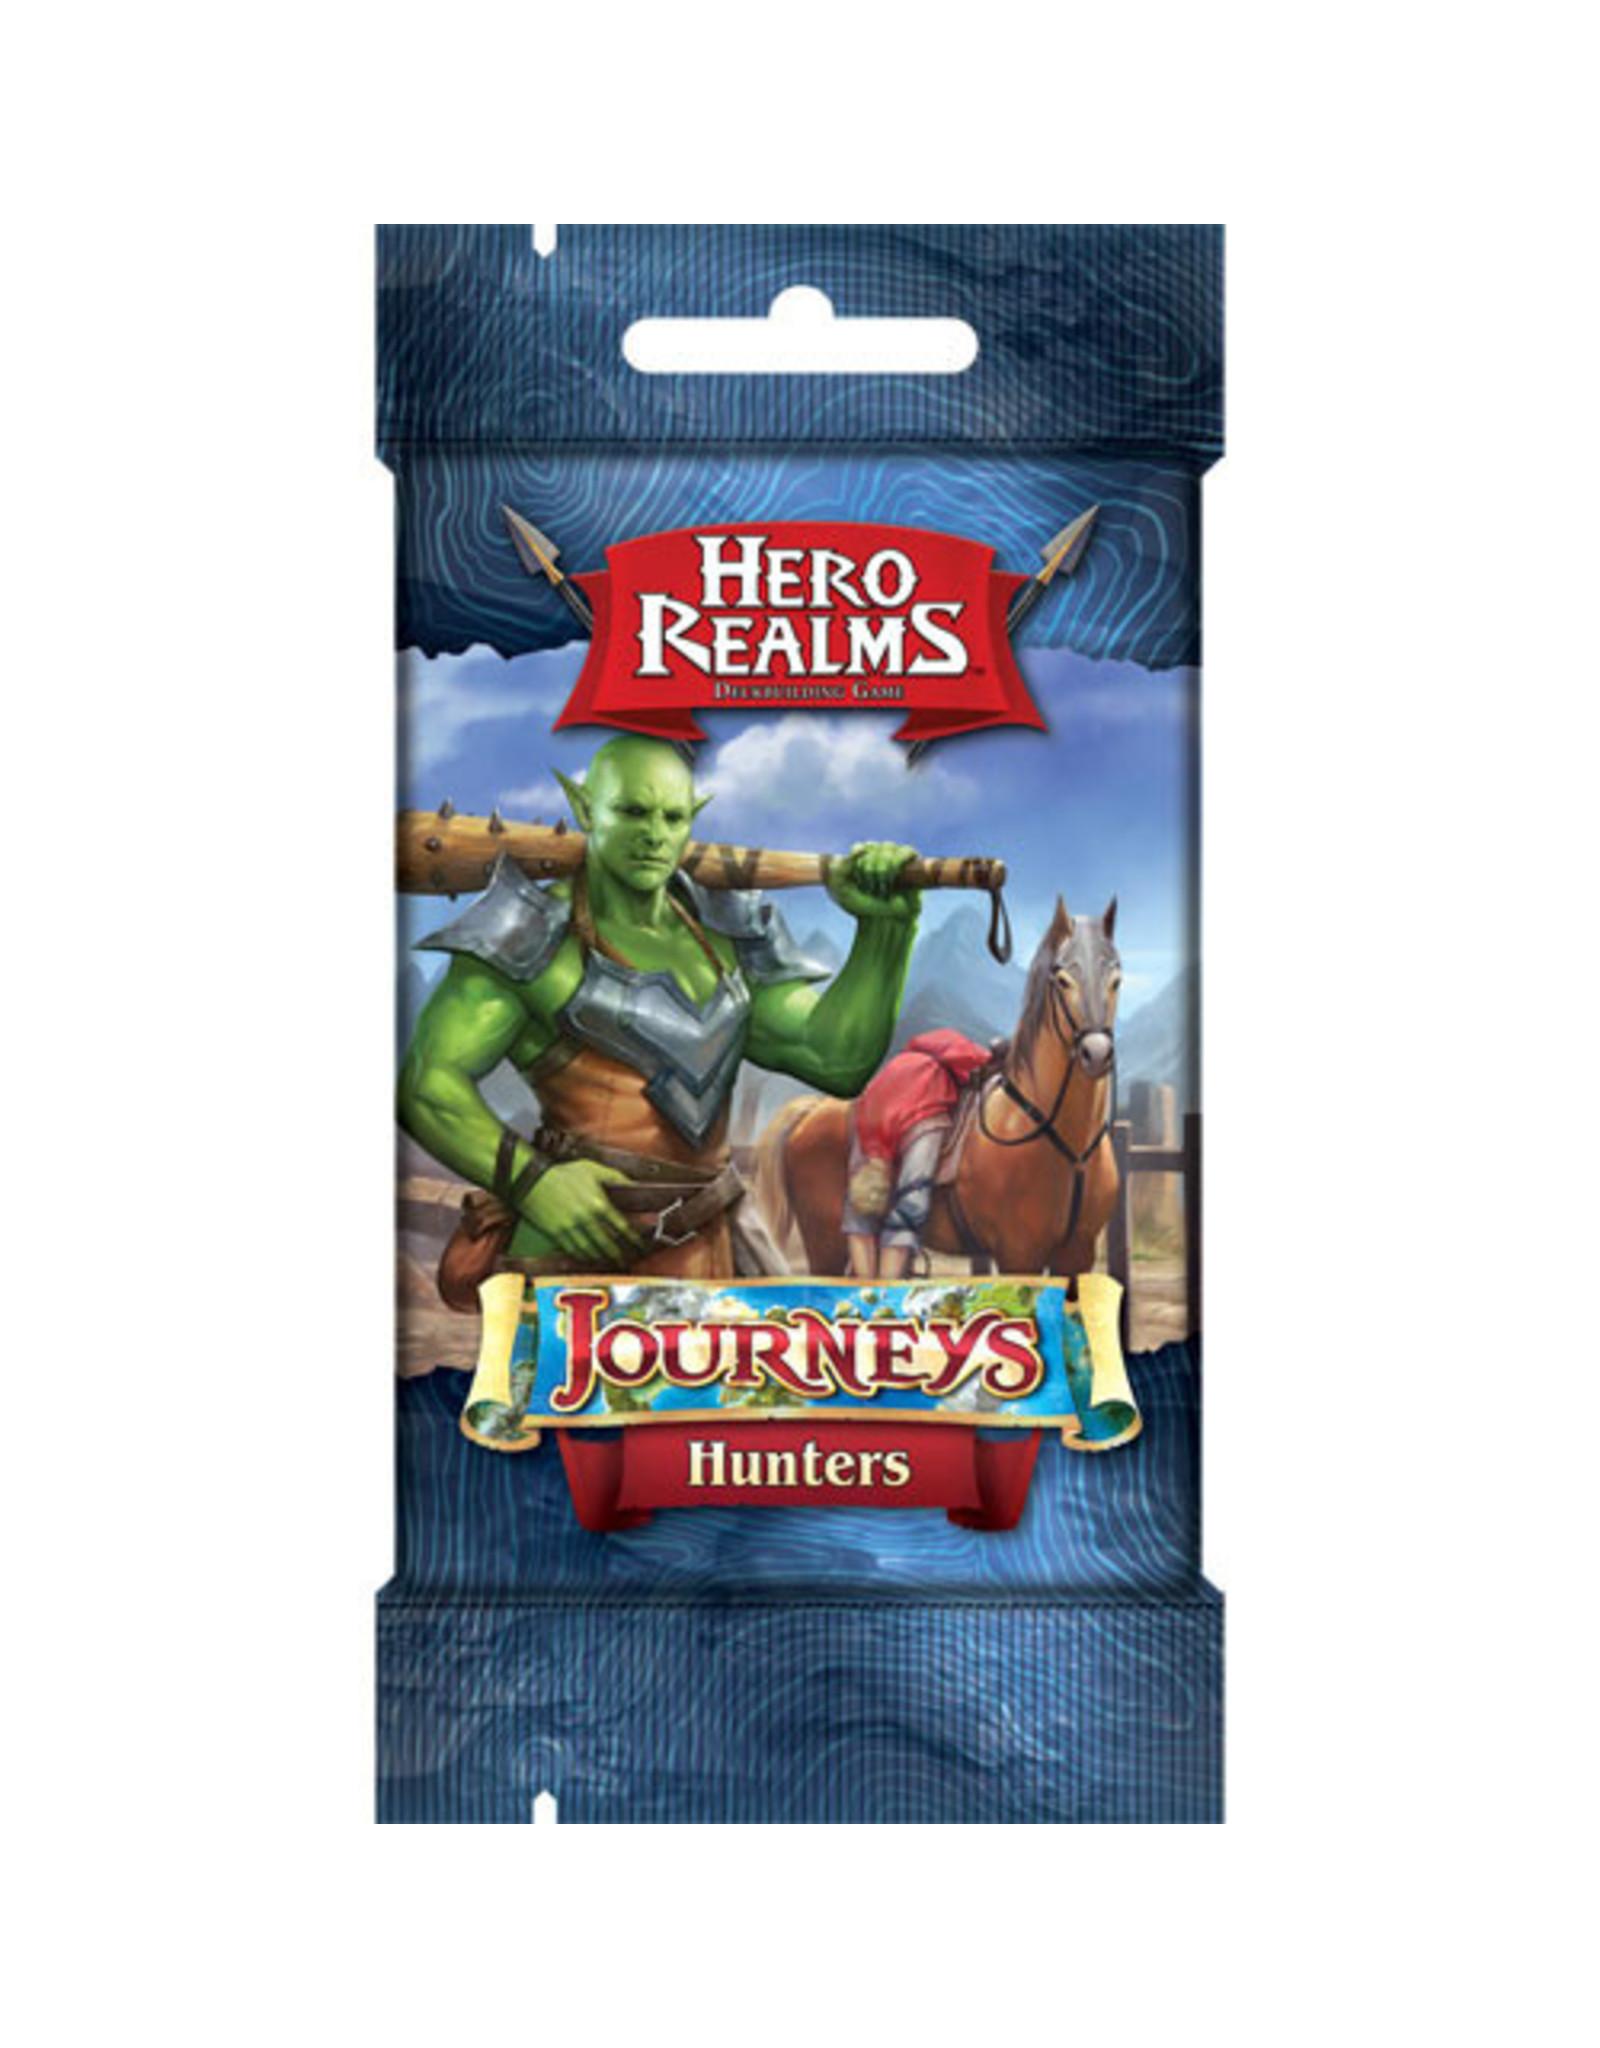 White Wizard Games Hero Realms: Journeys: Hunters